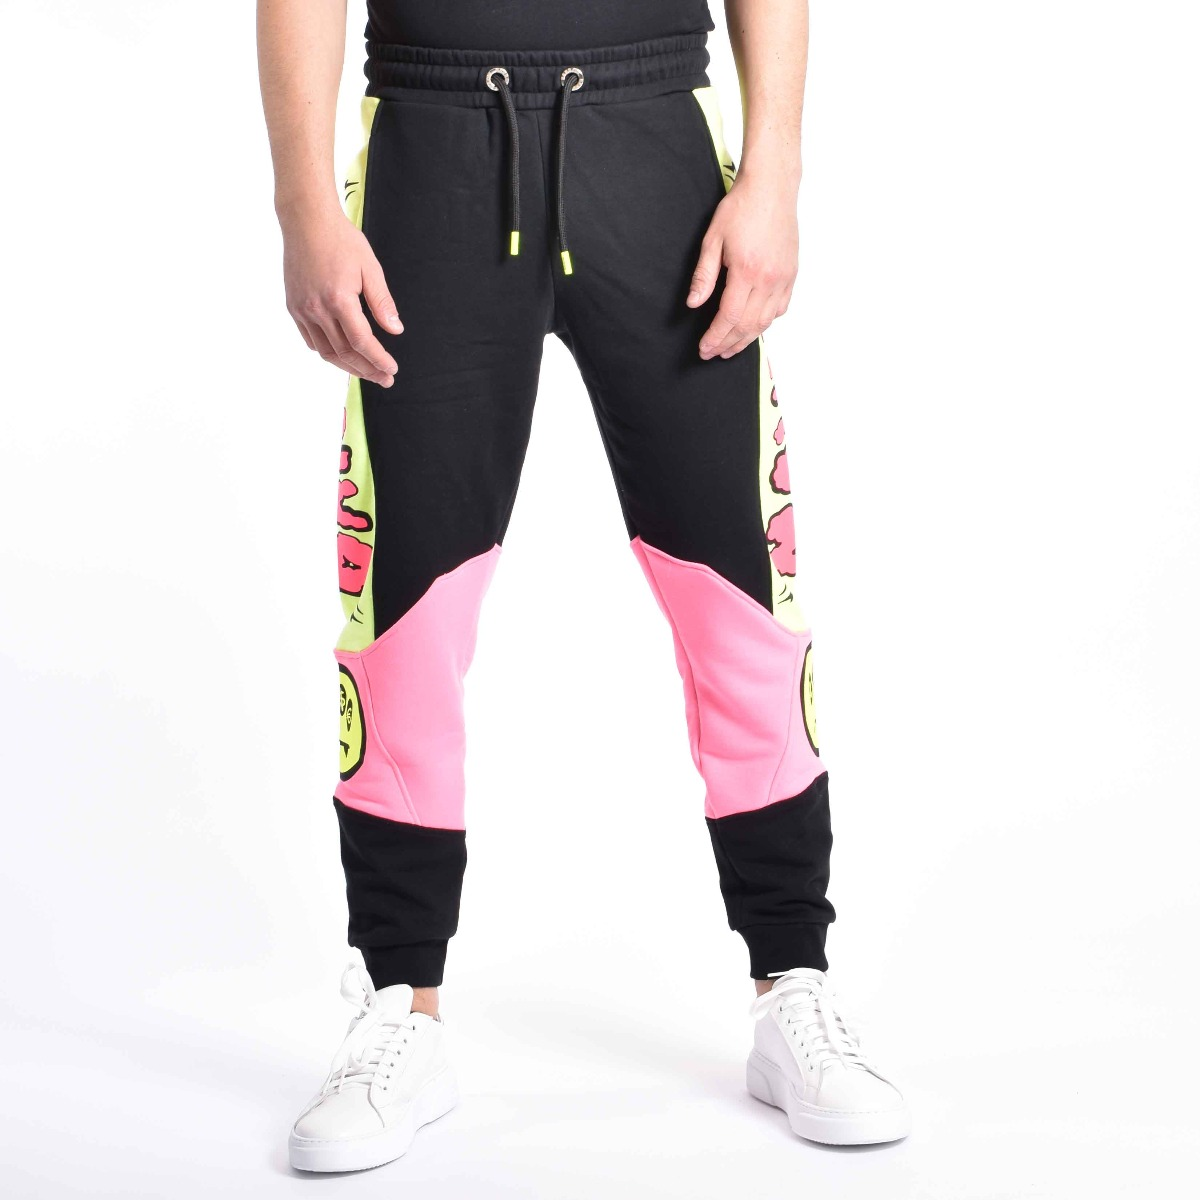 Pantalone tuta stampa serigrafica - Nero